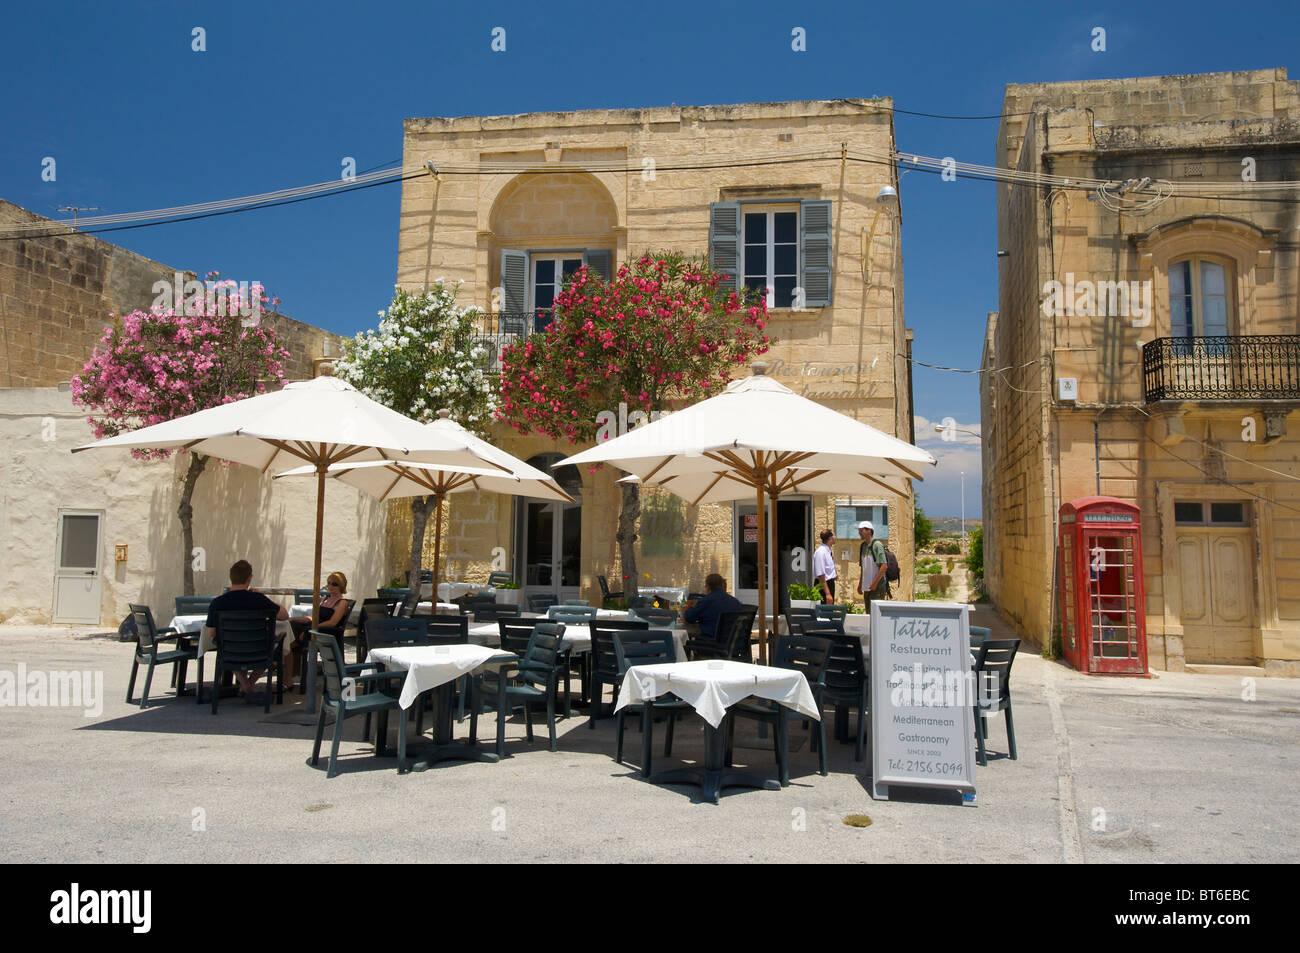 Street Cafe in San Lawrenz, Gozo Island Malta - Stock Image